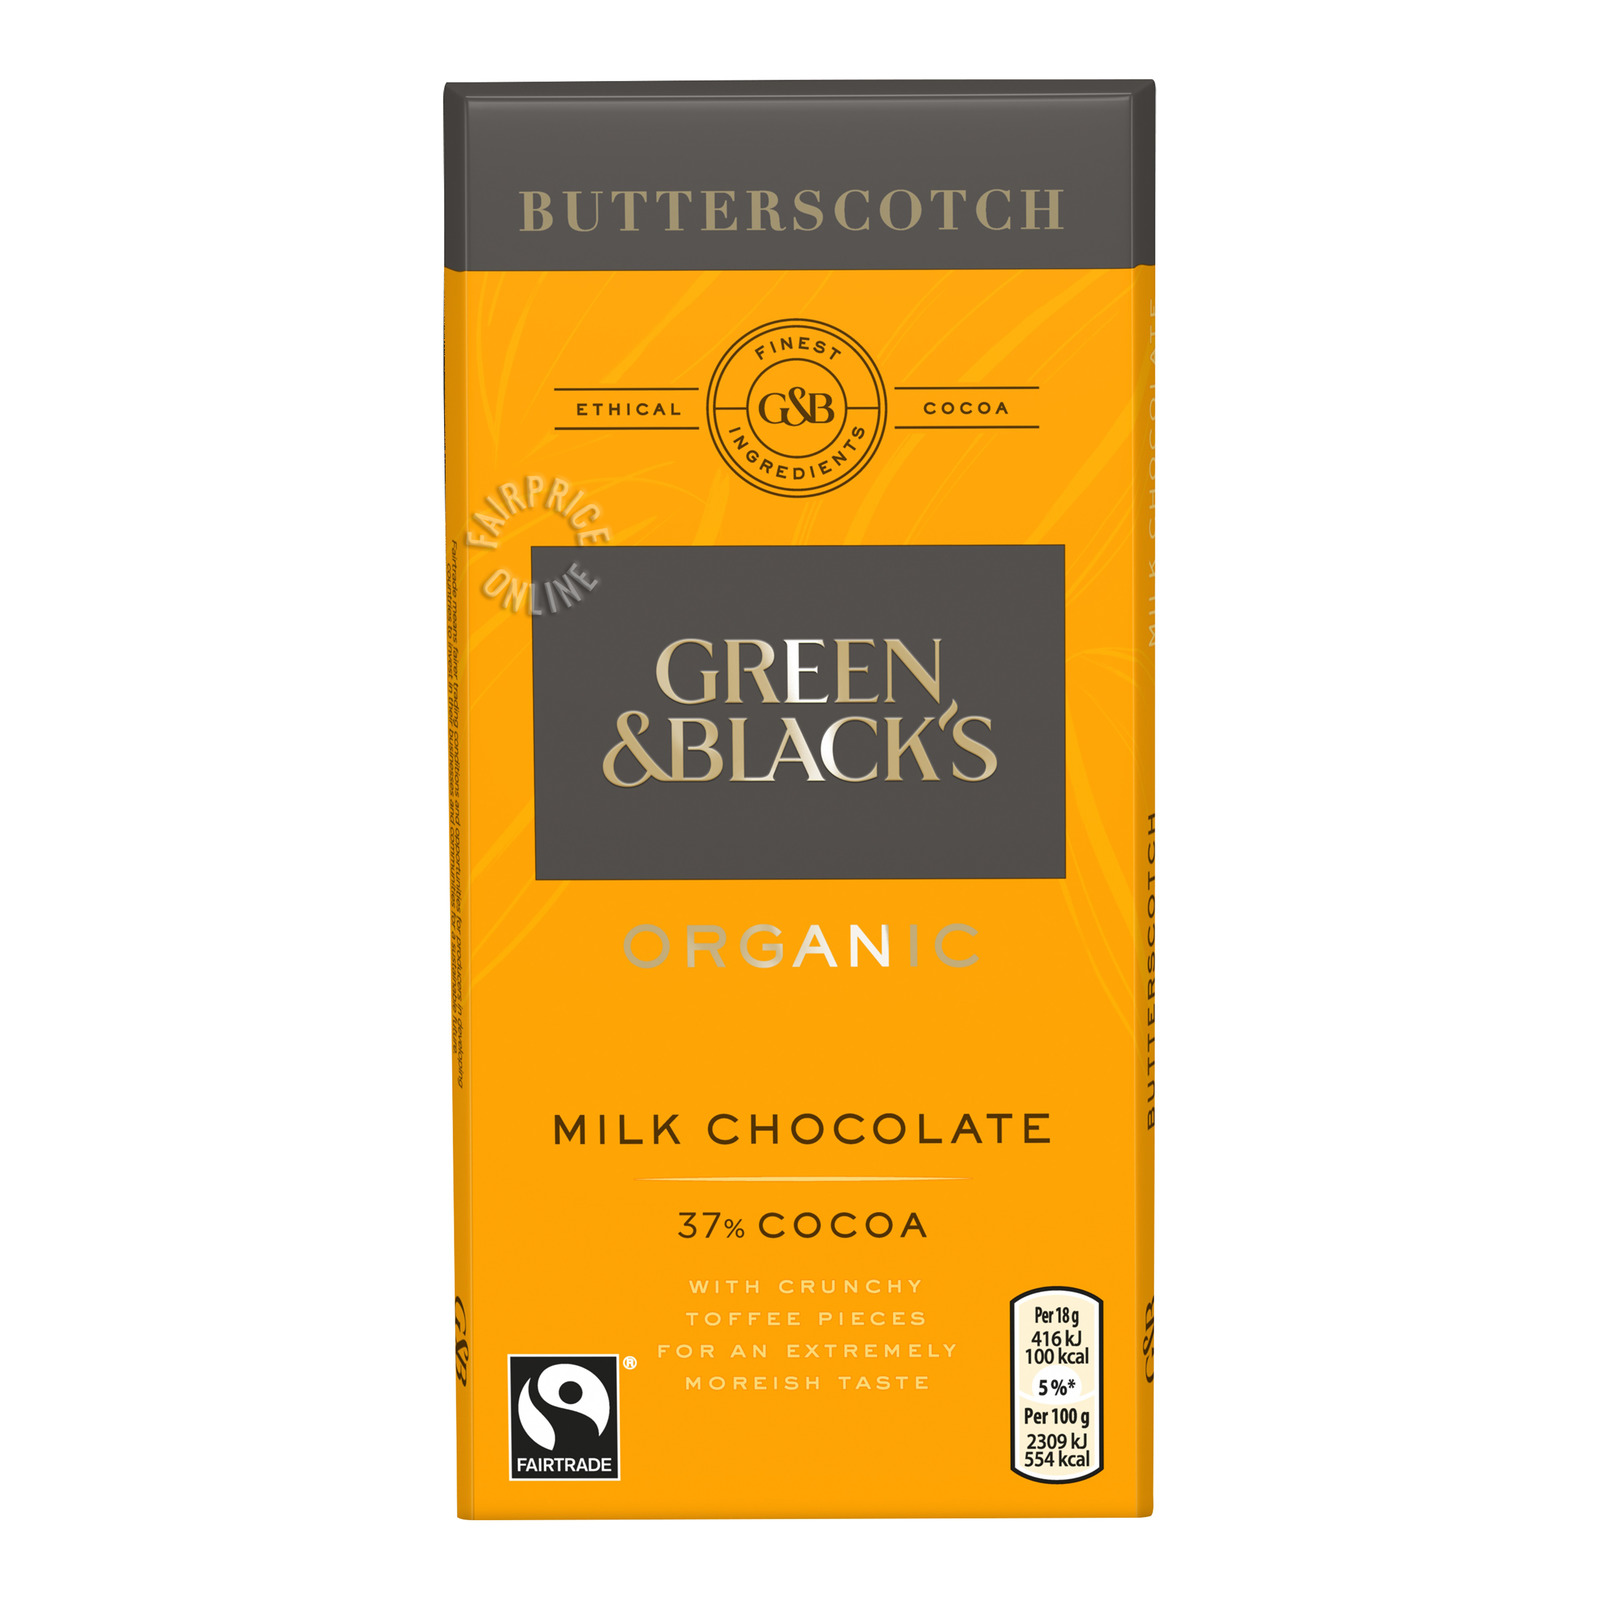 Green & Black's Organic Milk Chocolate Bar-Butterscotch